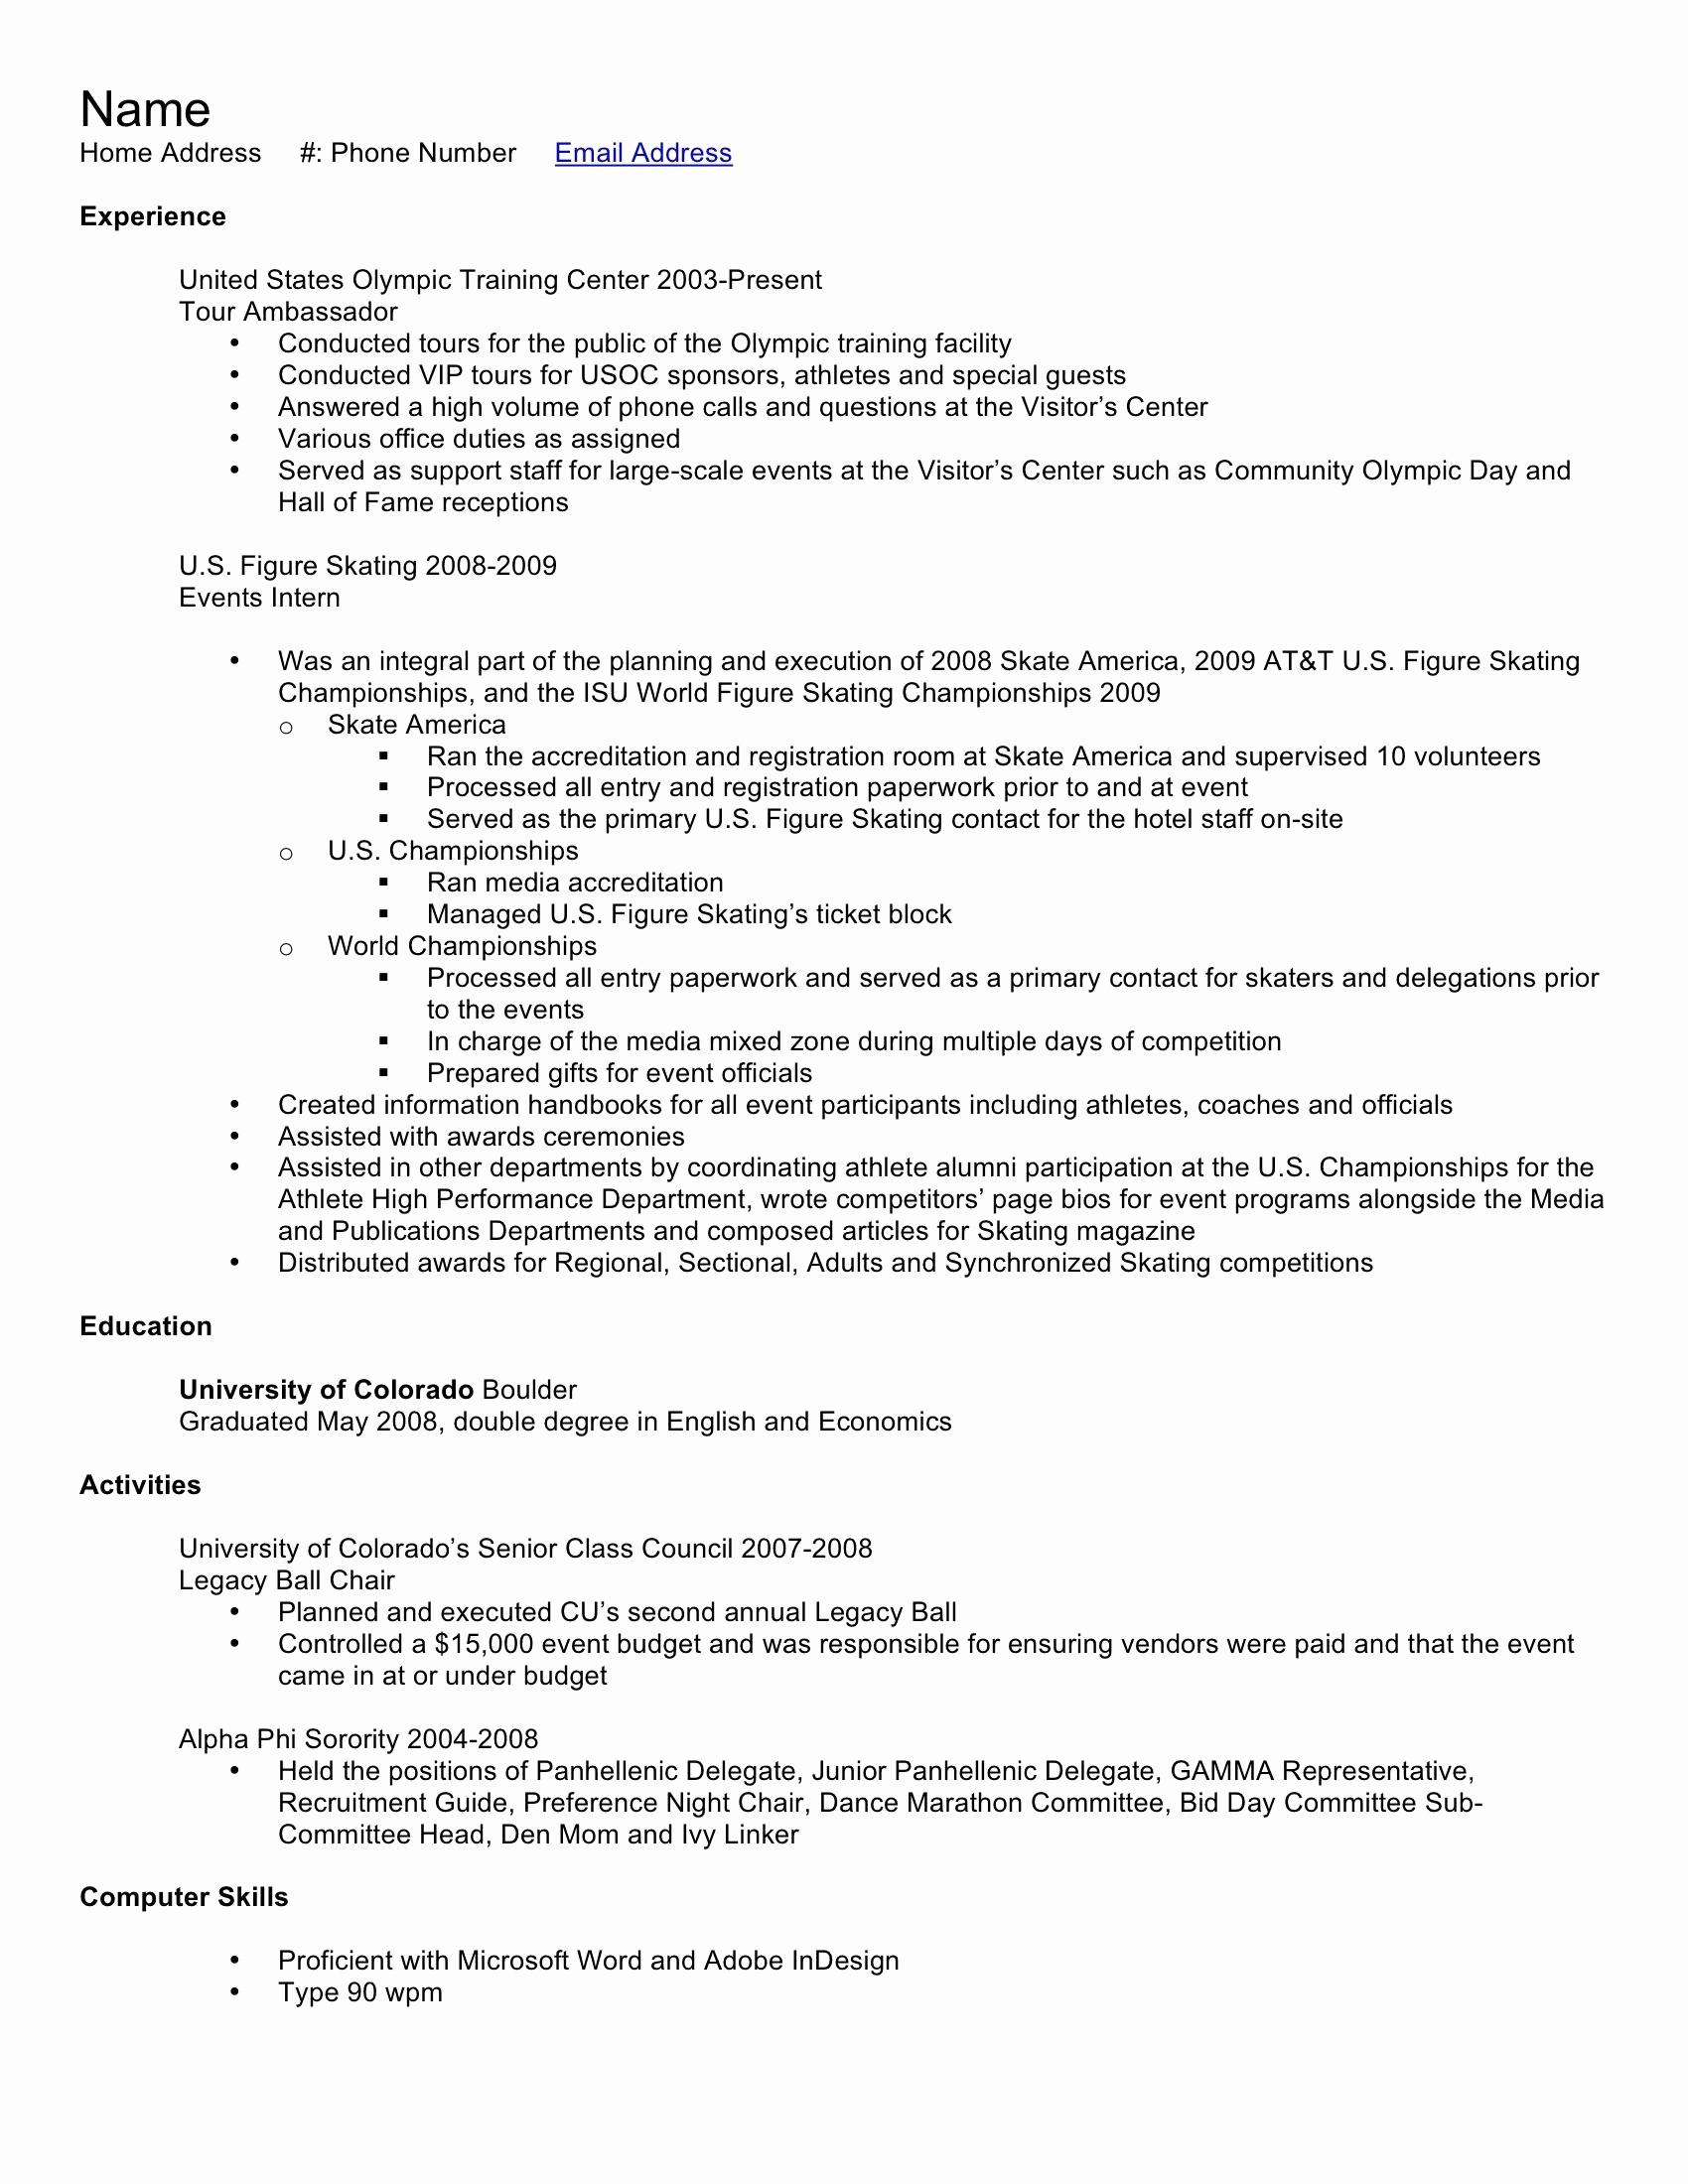 Resume for Entry Level Position Elegant Entry Level Resume Samples High School Graduate Save